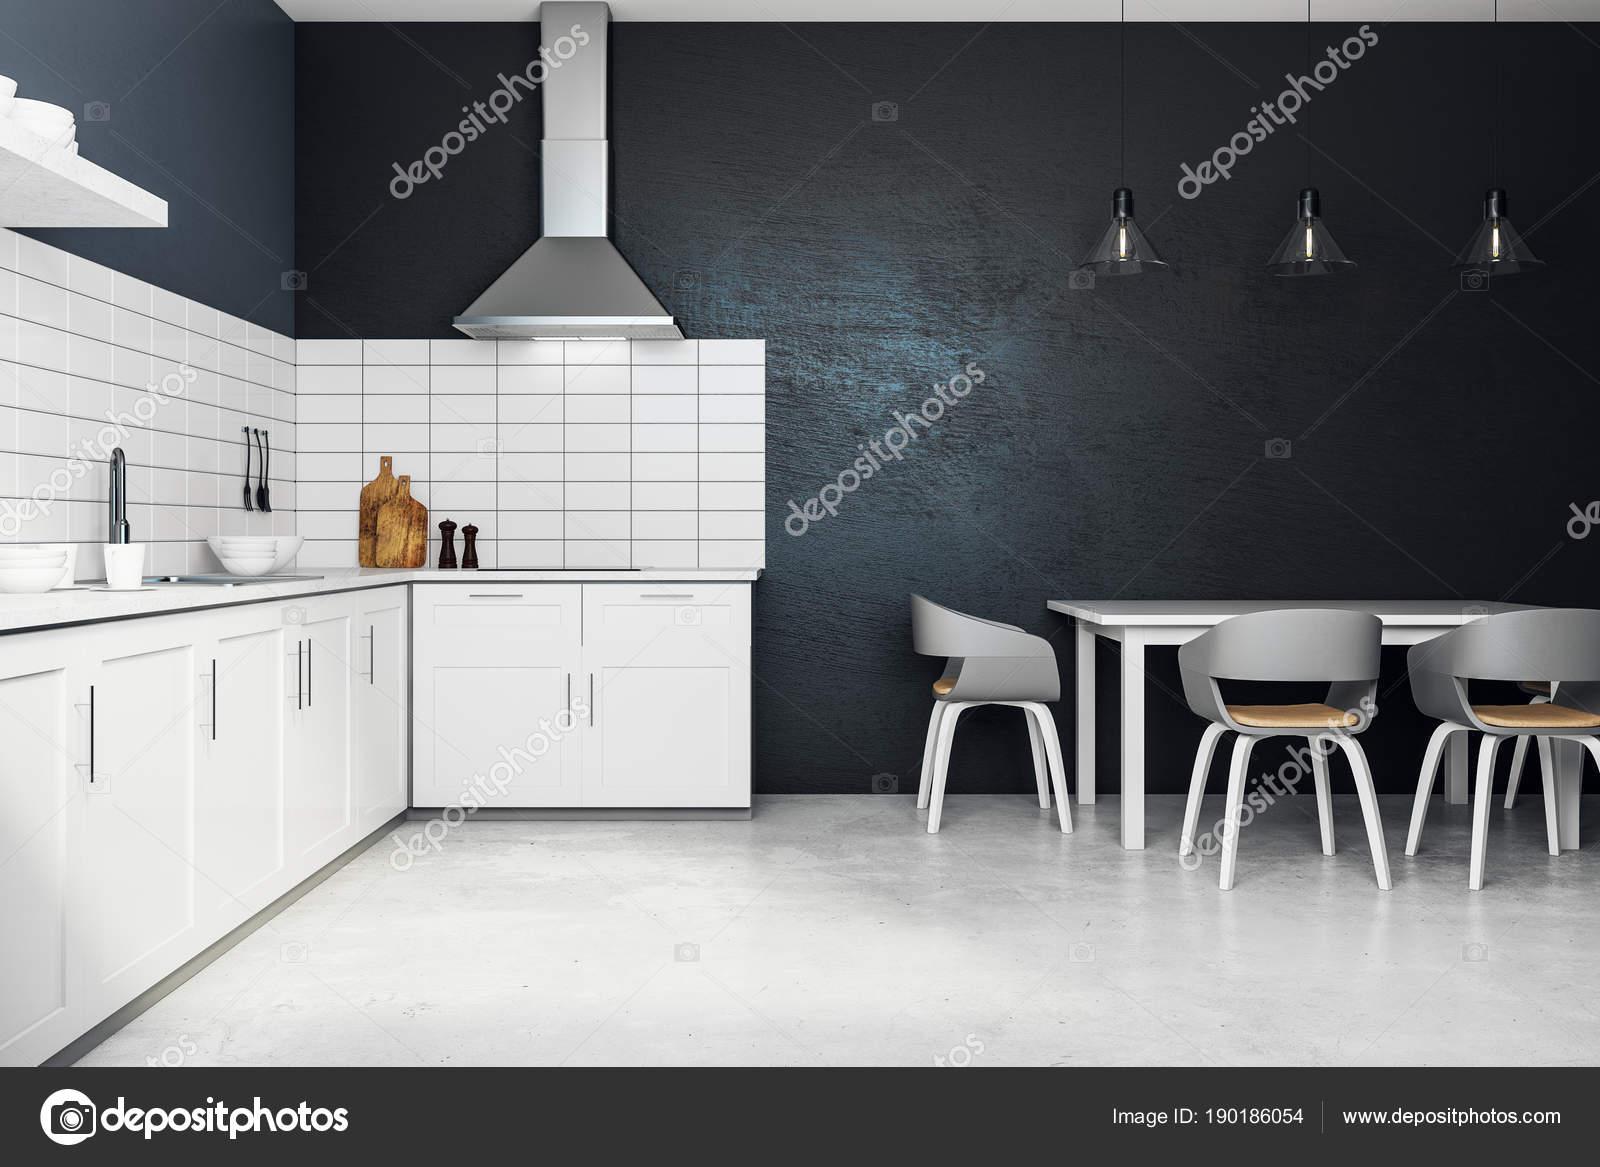 Nieuwe witte keuken interieur u2014 stockfoto © peshkova #190186054